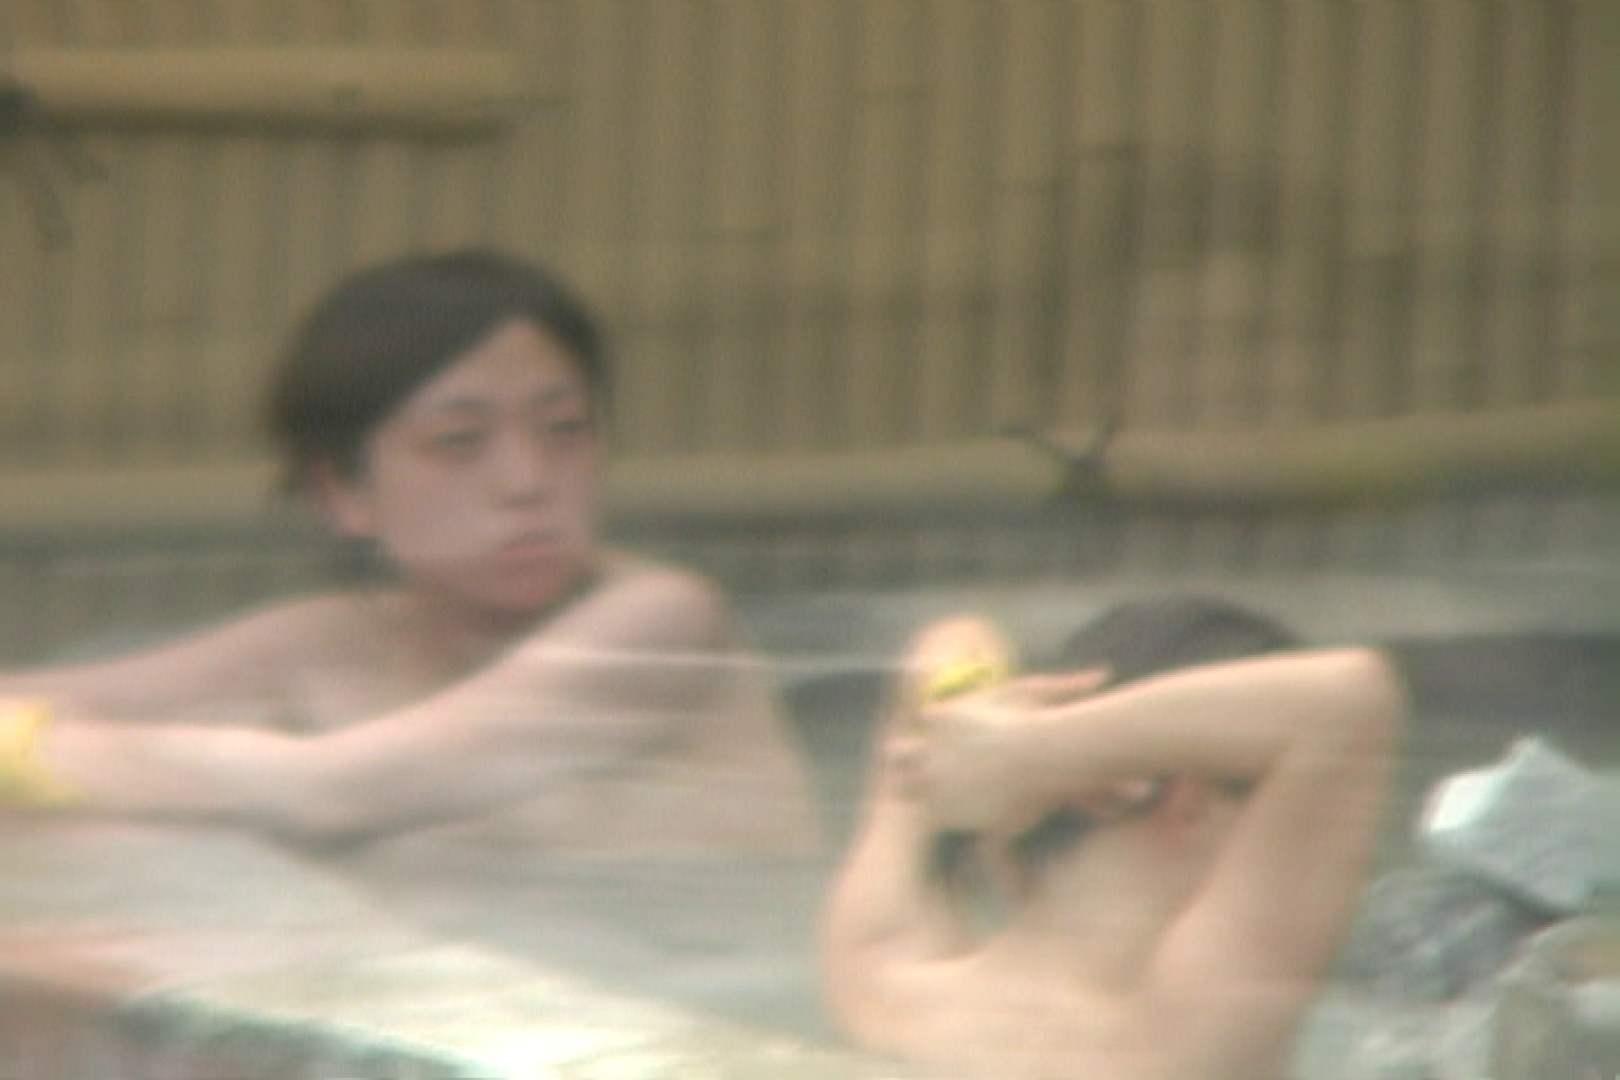 Aquaな露天風呂Vol.562 露天 AV無料動画キャプチャ 109画像 8